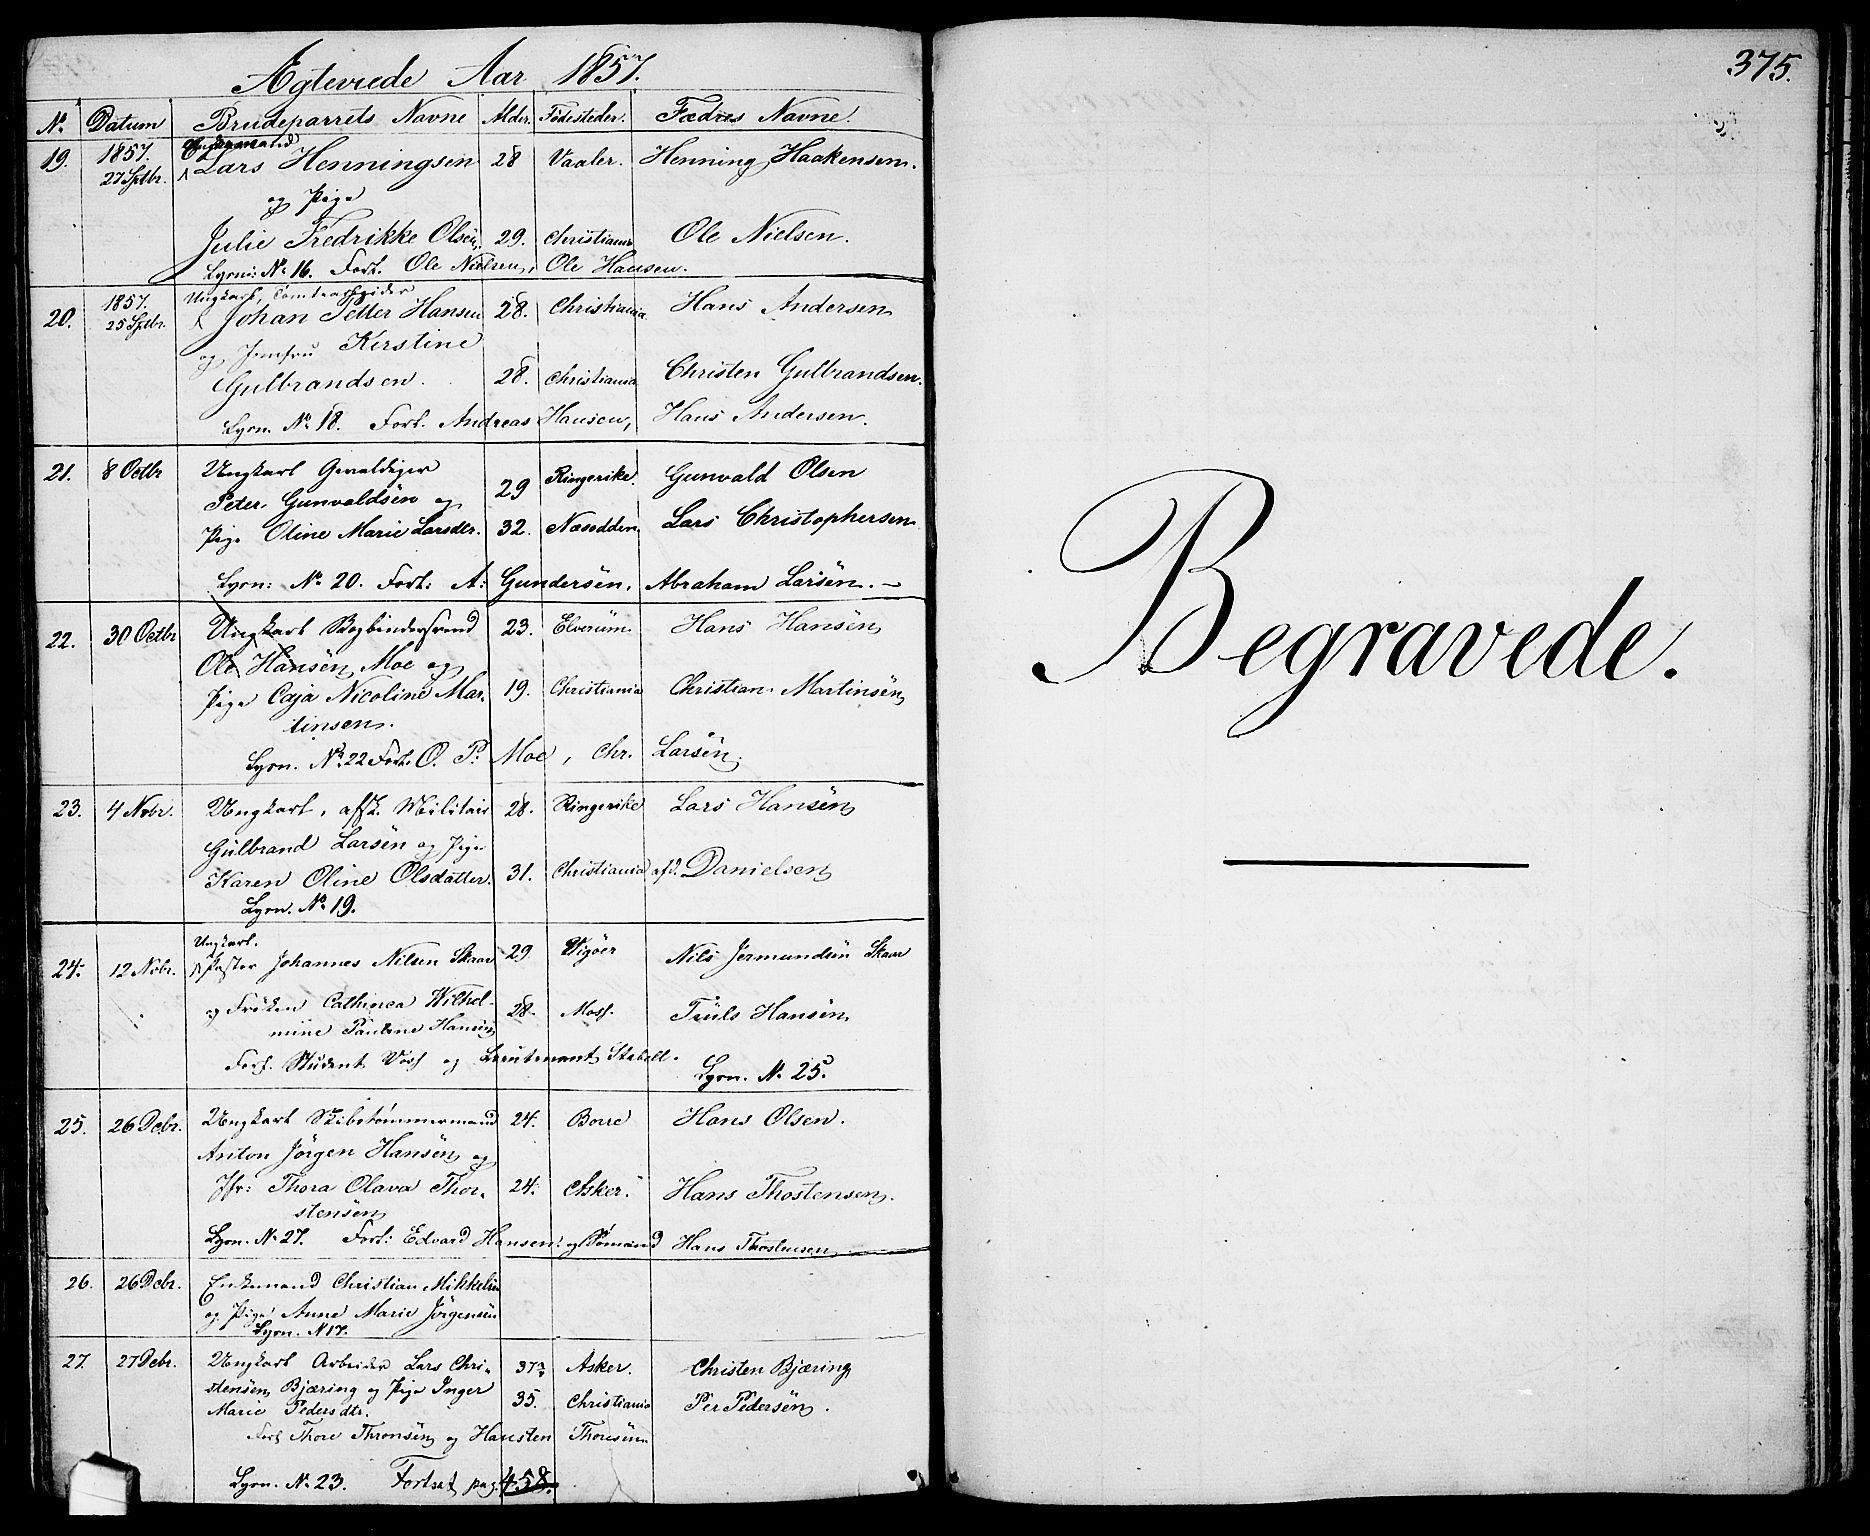 SAO, Garnisonsmenigheten Kirkebøker, G/Ga/L0005: Parish register (copy) no. 5, 1841-1860, p. 375